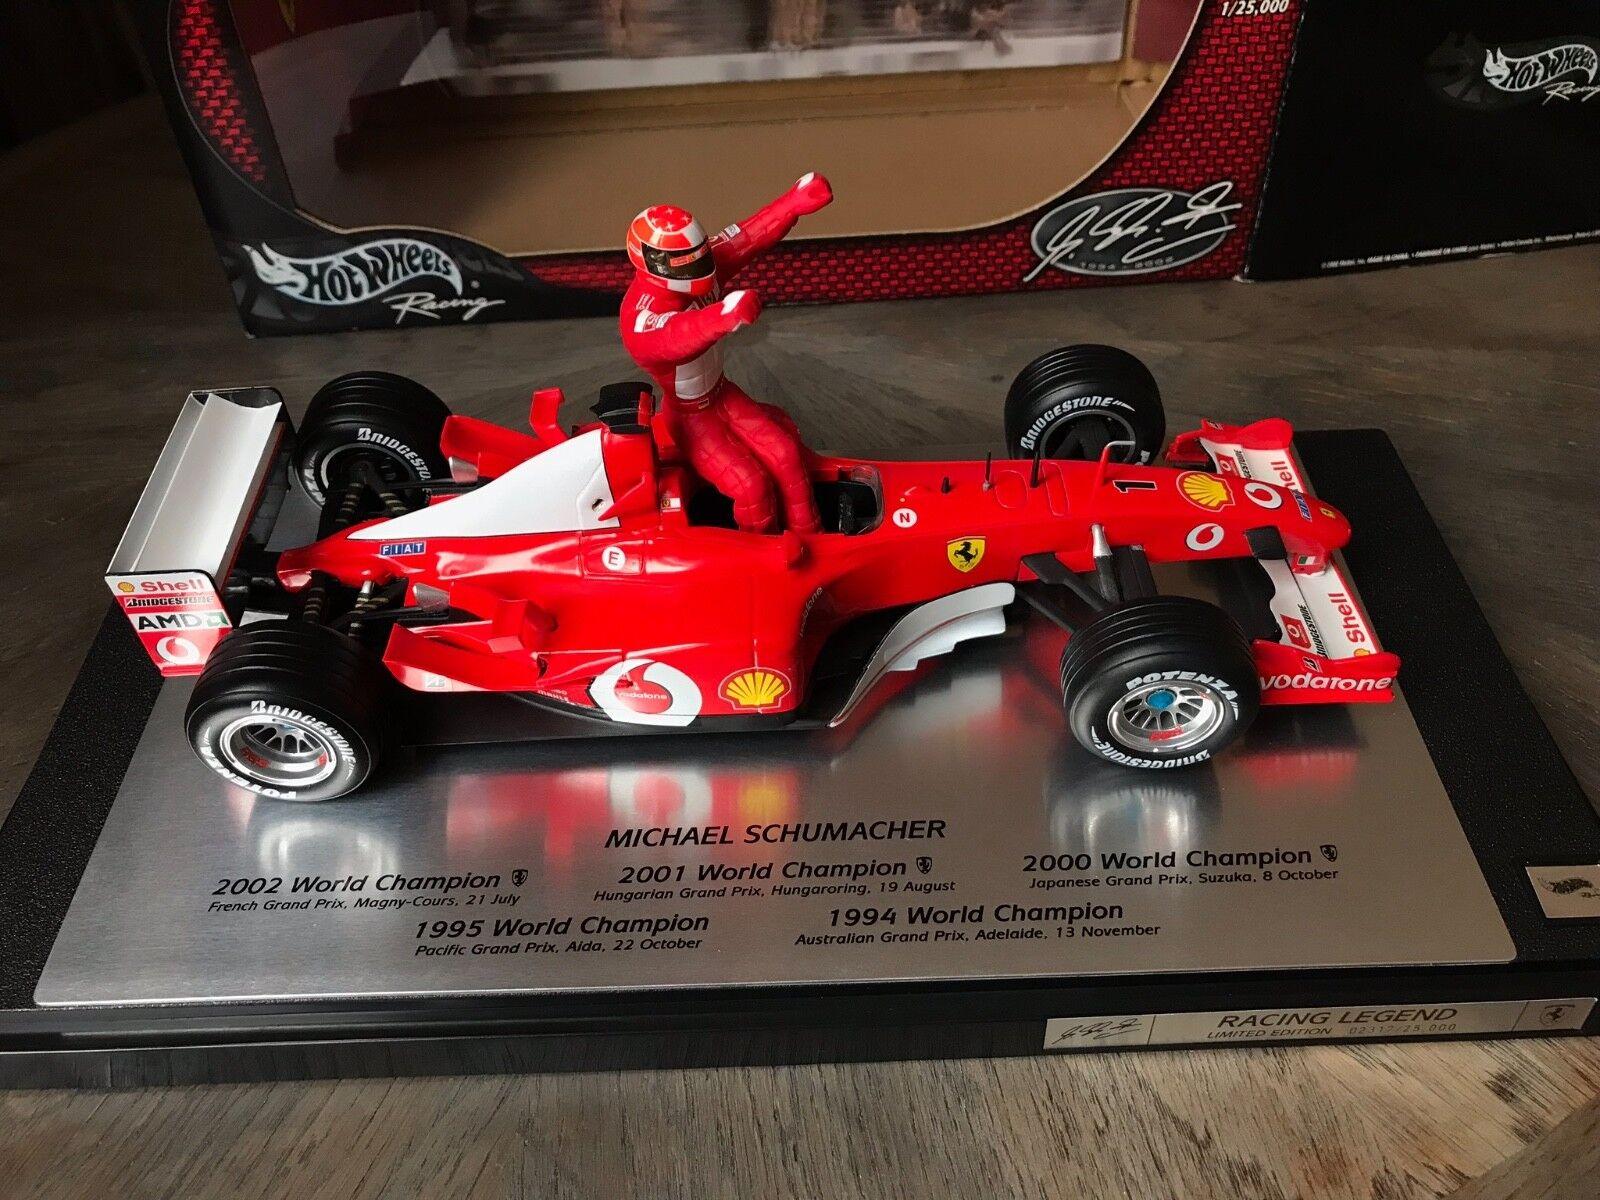 F1 Ferrari F2002, Ltd 5ème titre Mondial SCHUMACHER, 1 18 avec boite